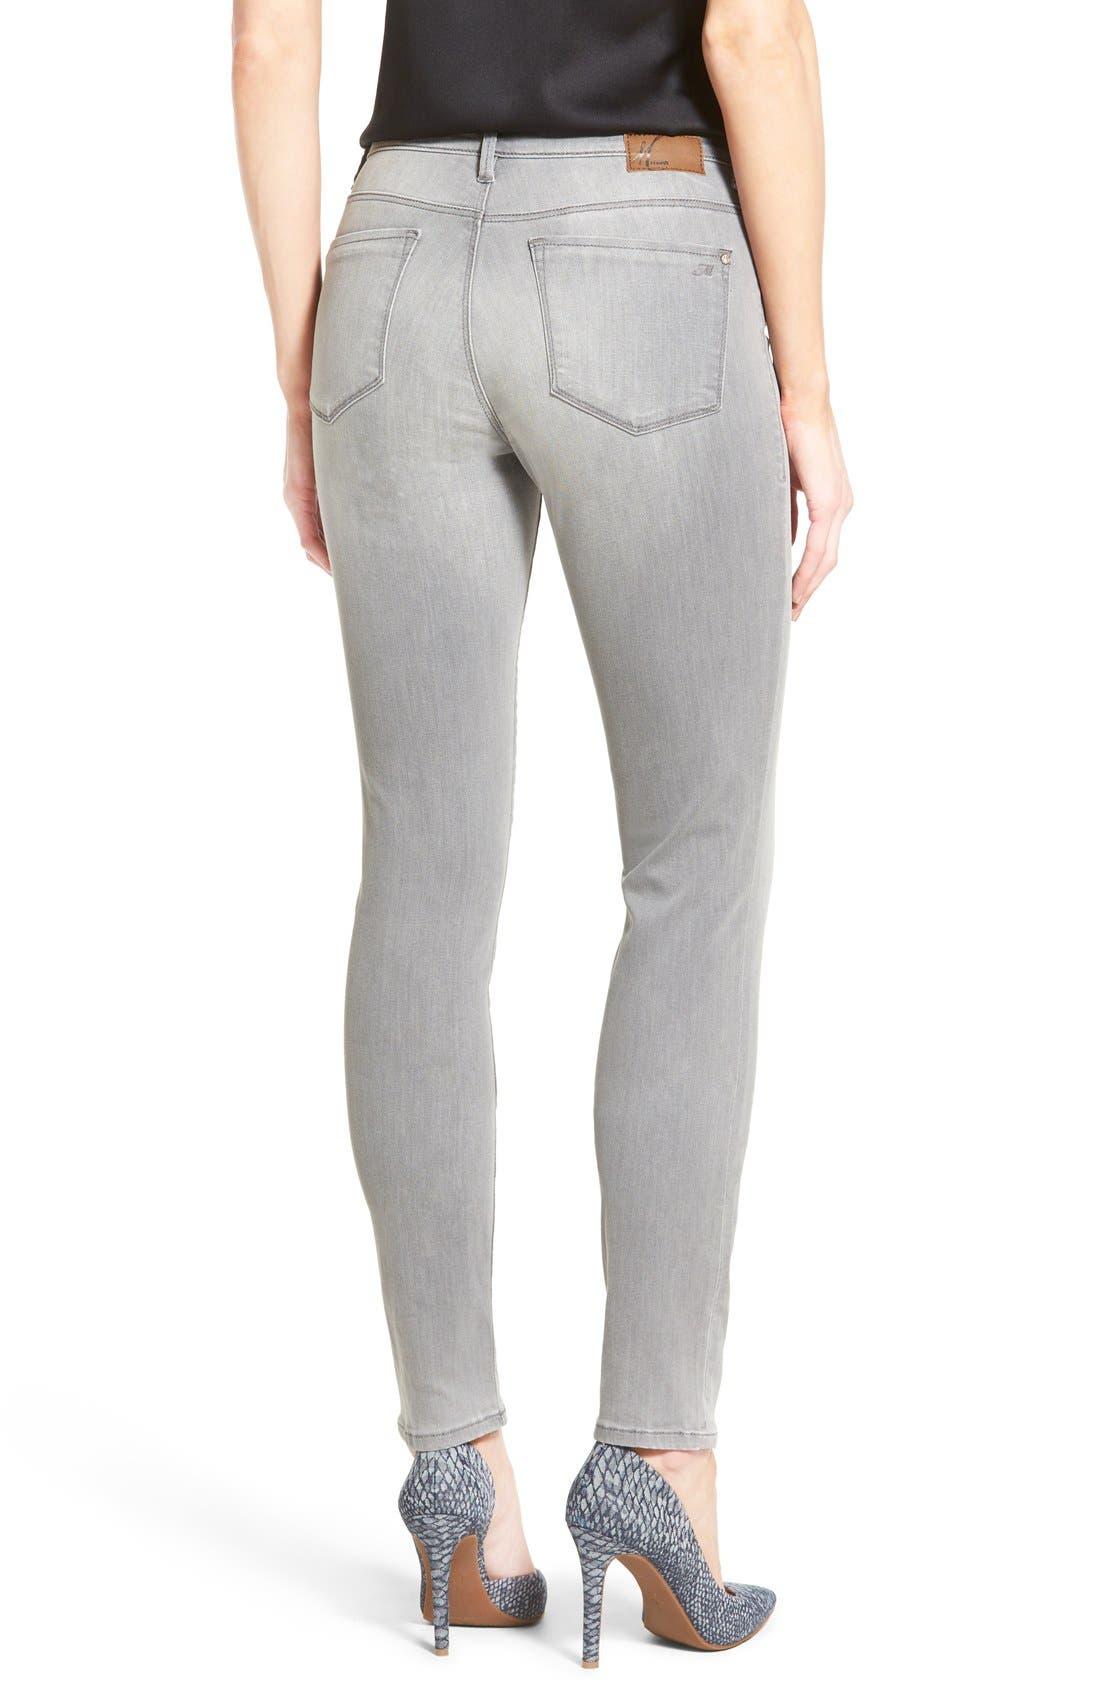 'Alissa' Stretch Skinny Jeans,                             Alternate thumbnail 2, color,                             Alissa Light Grey Tribeca